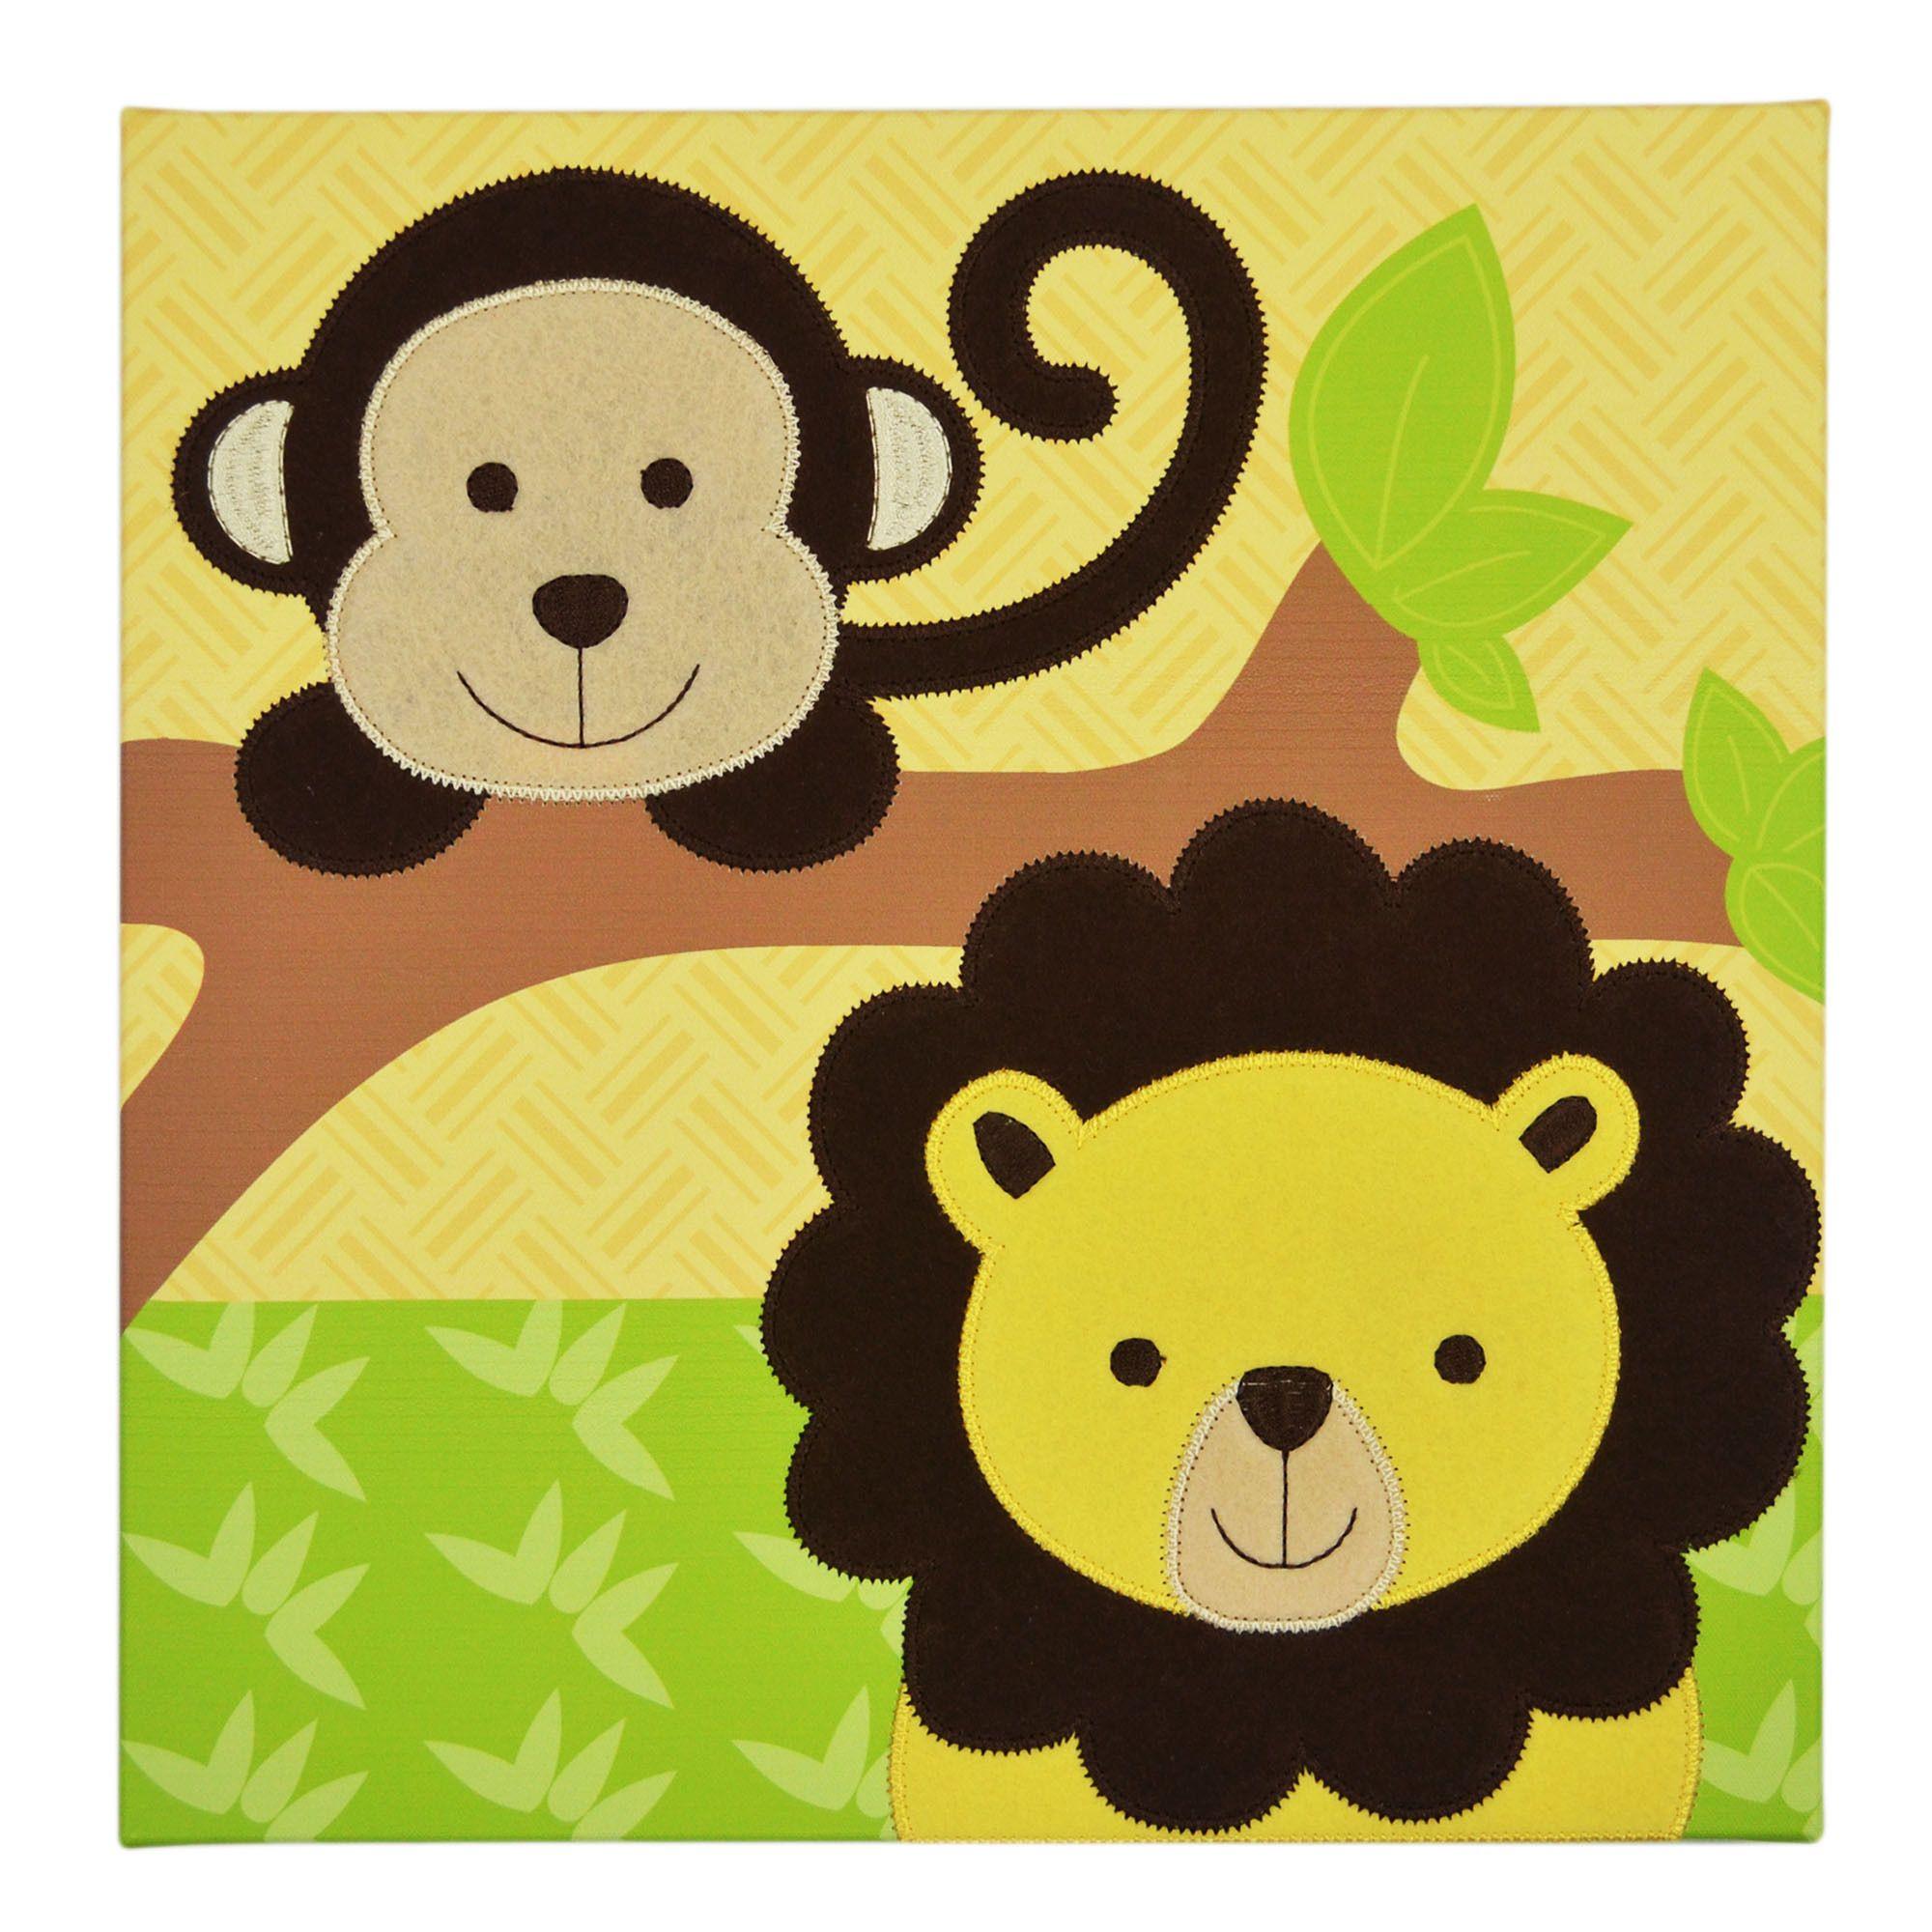 Farallon Koala Baby Jungle Embellished Wall Art | Products ...